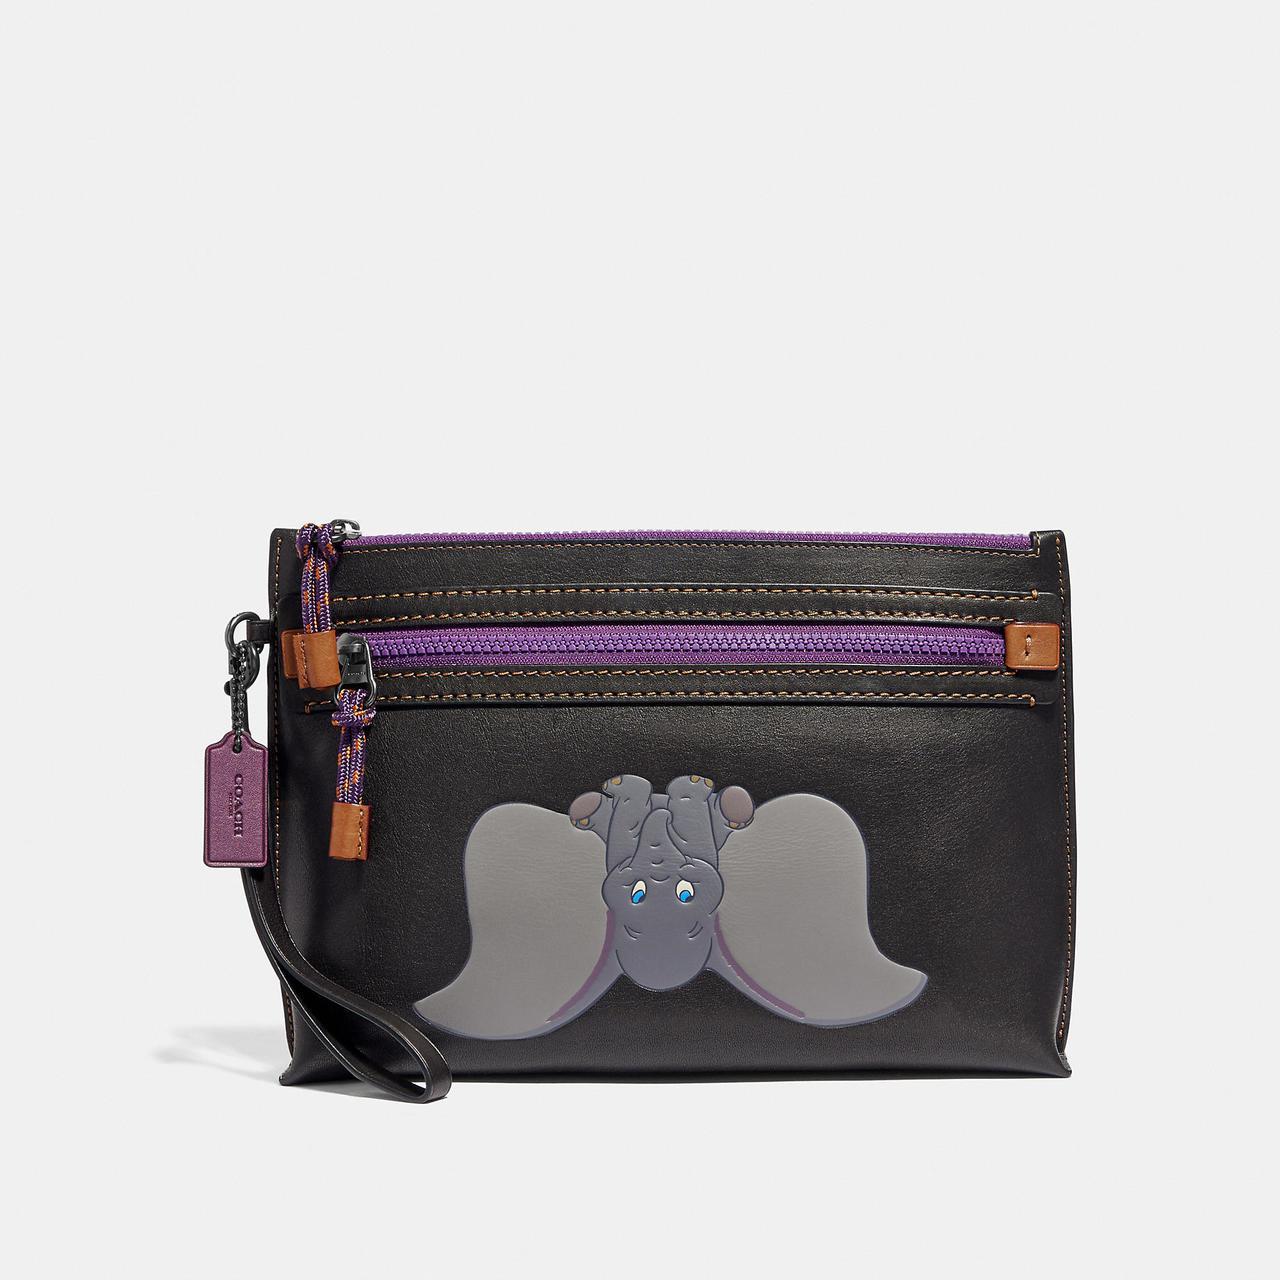 Dumbo印花多功能手袋(可放iPad),售價14,800元。圖/COACH提供